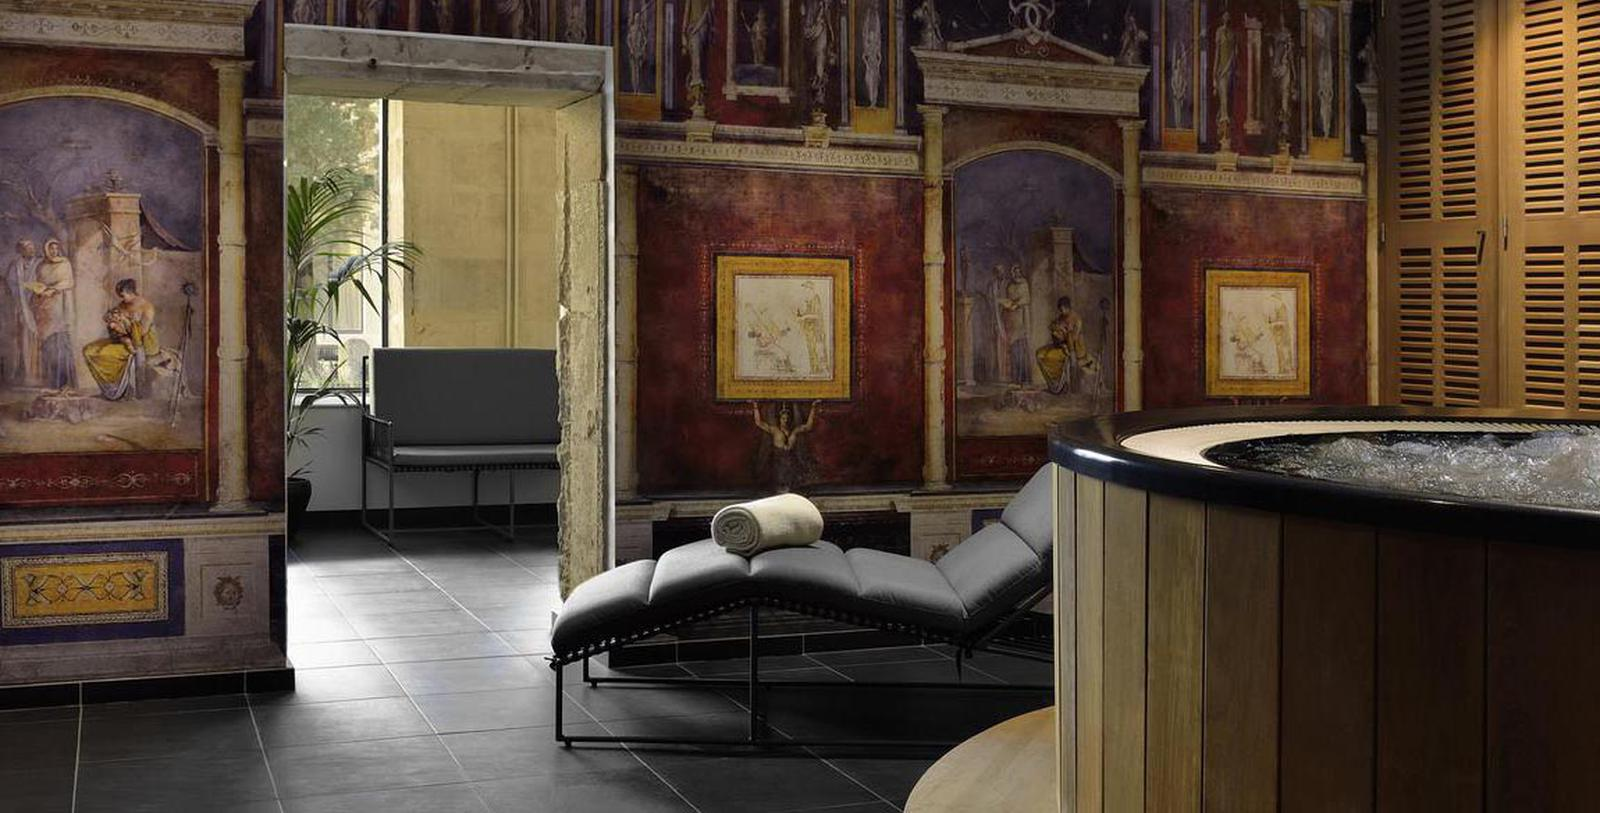 Image of Entance Hôtel & Spa Jules César Arles – MGallery by Sofitel, 1661, Member of Historic Hotels Worldwide, in Arles, France, Spa